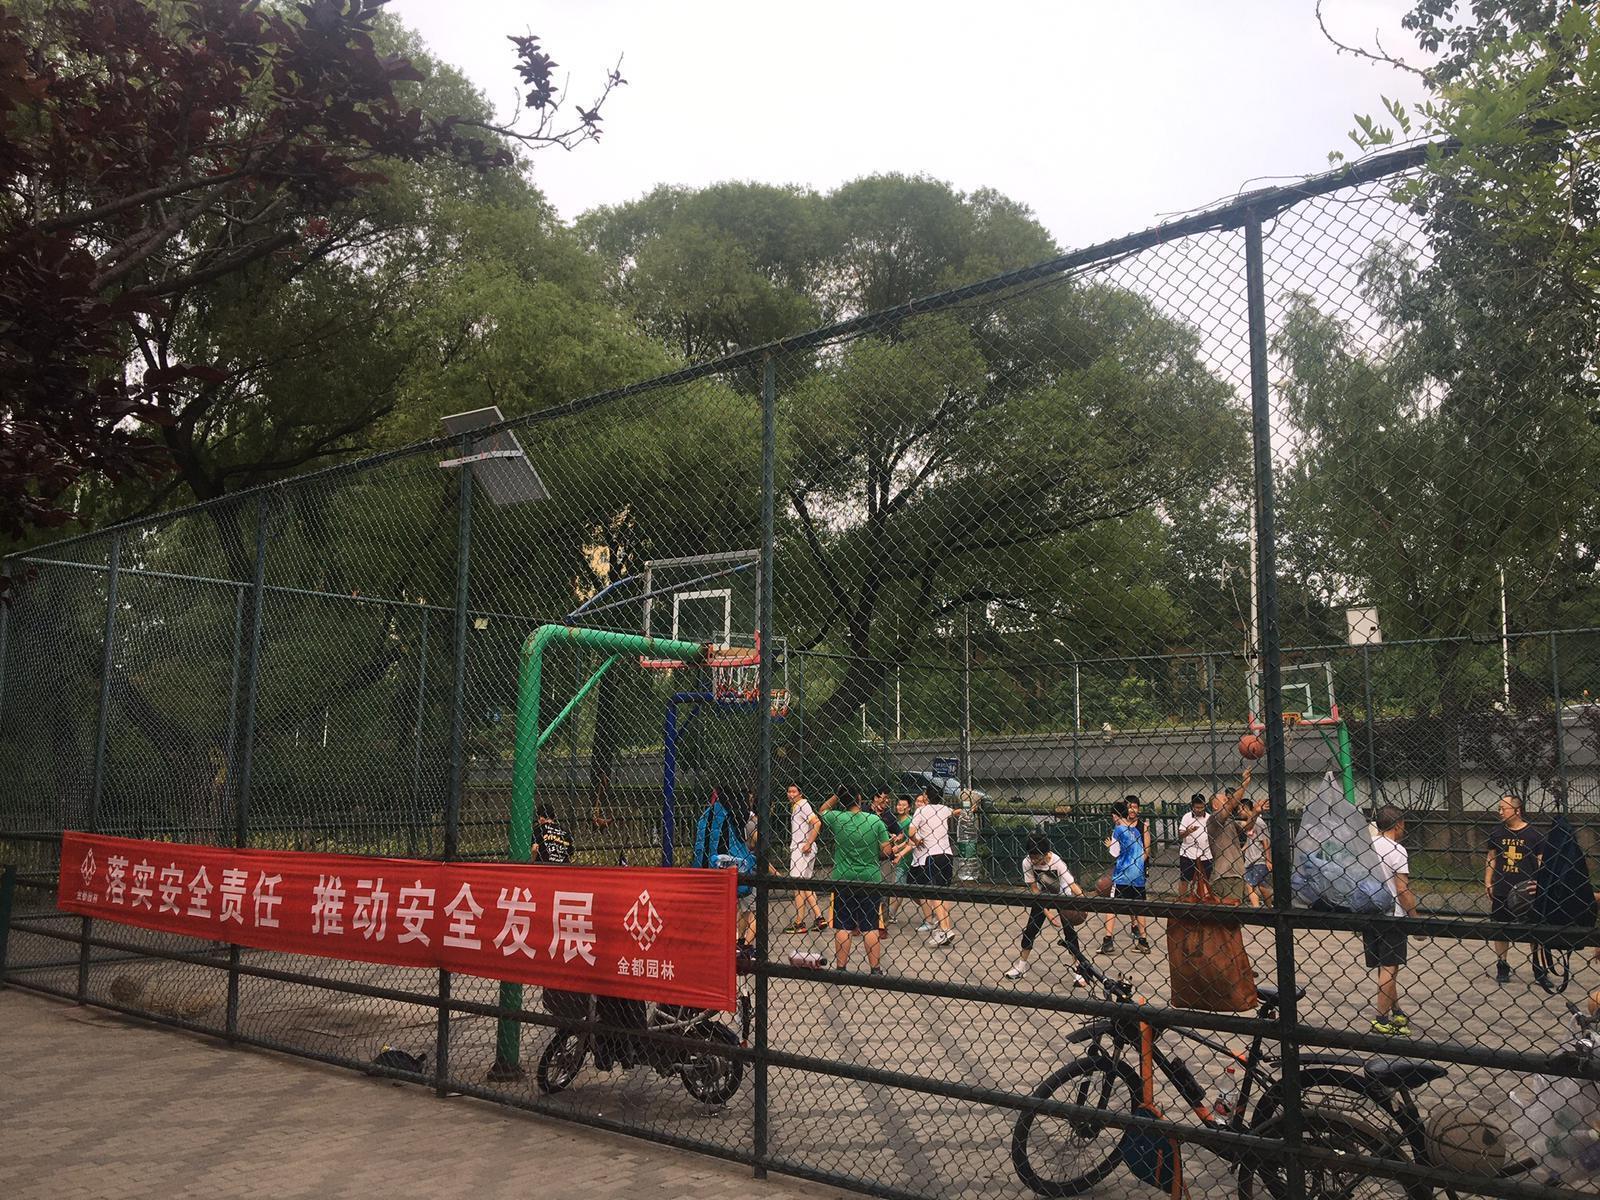 Photo épisode 1 Pékin (serie basket)